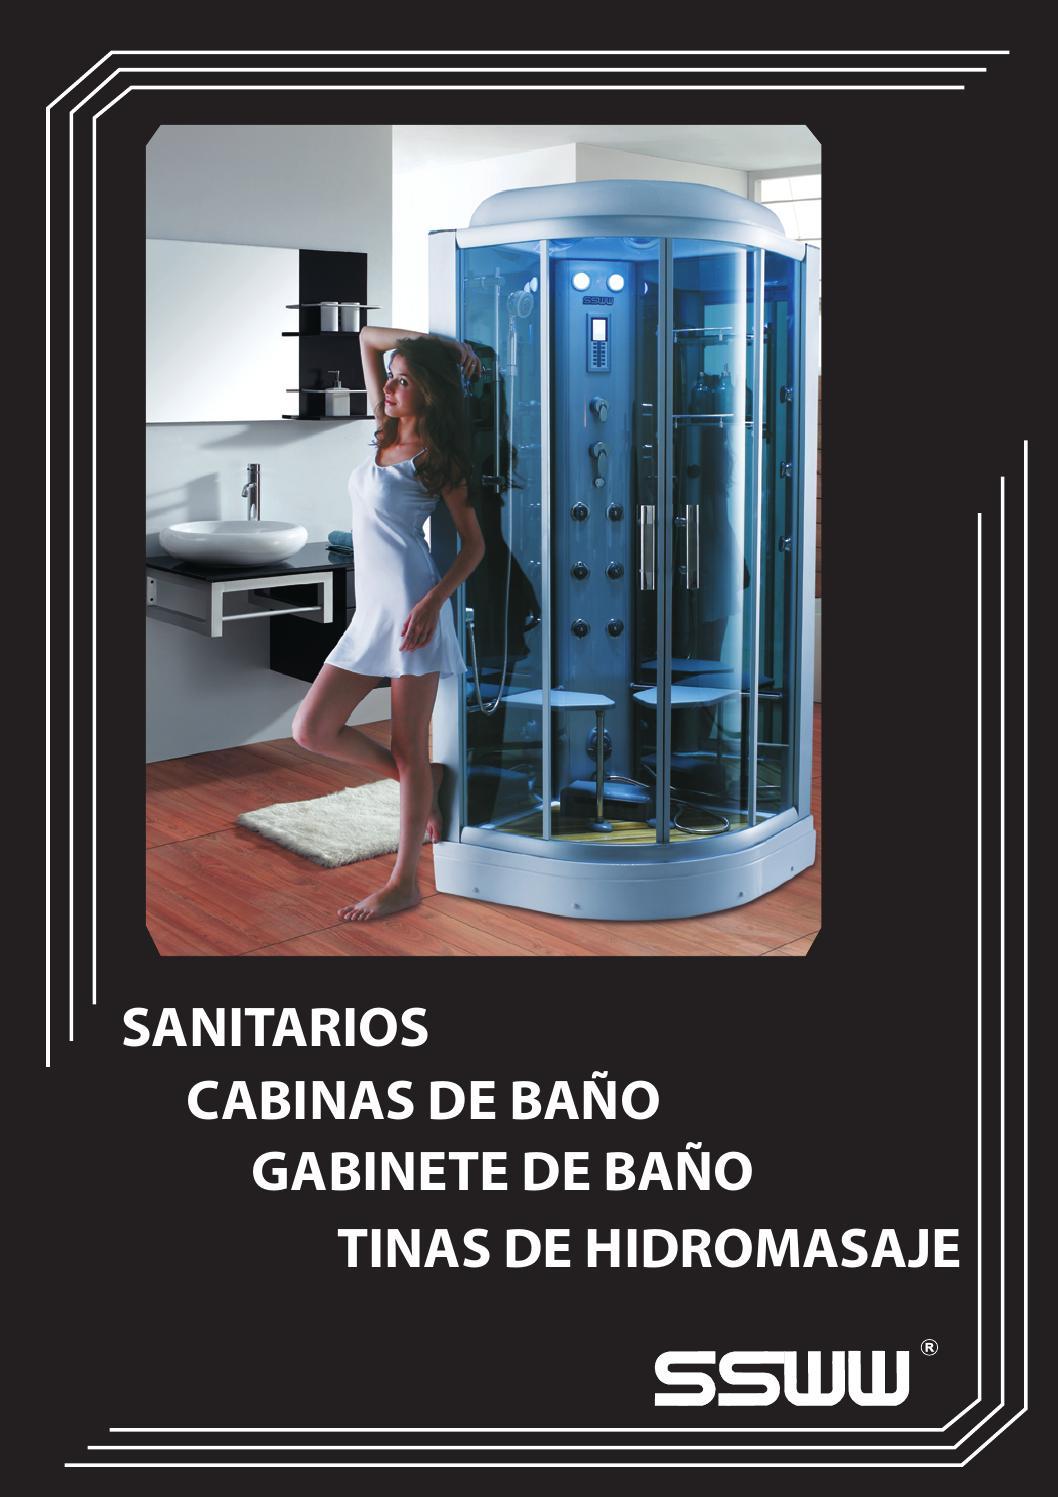 Tinas y cabinas de ba os ssww by stalin zambrano issuu for Cabinas para banos precios